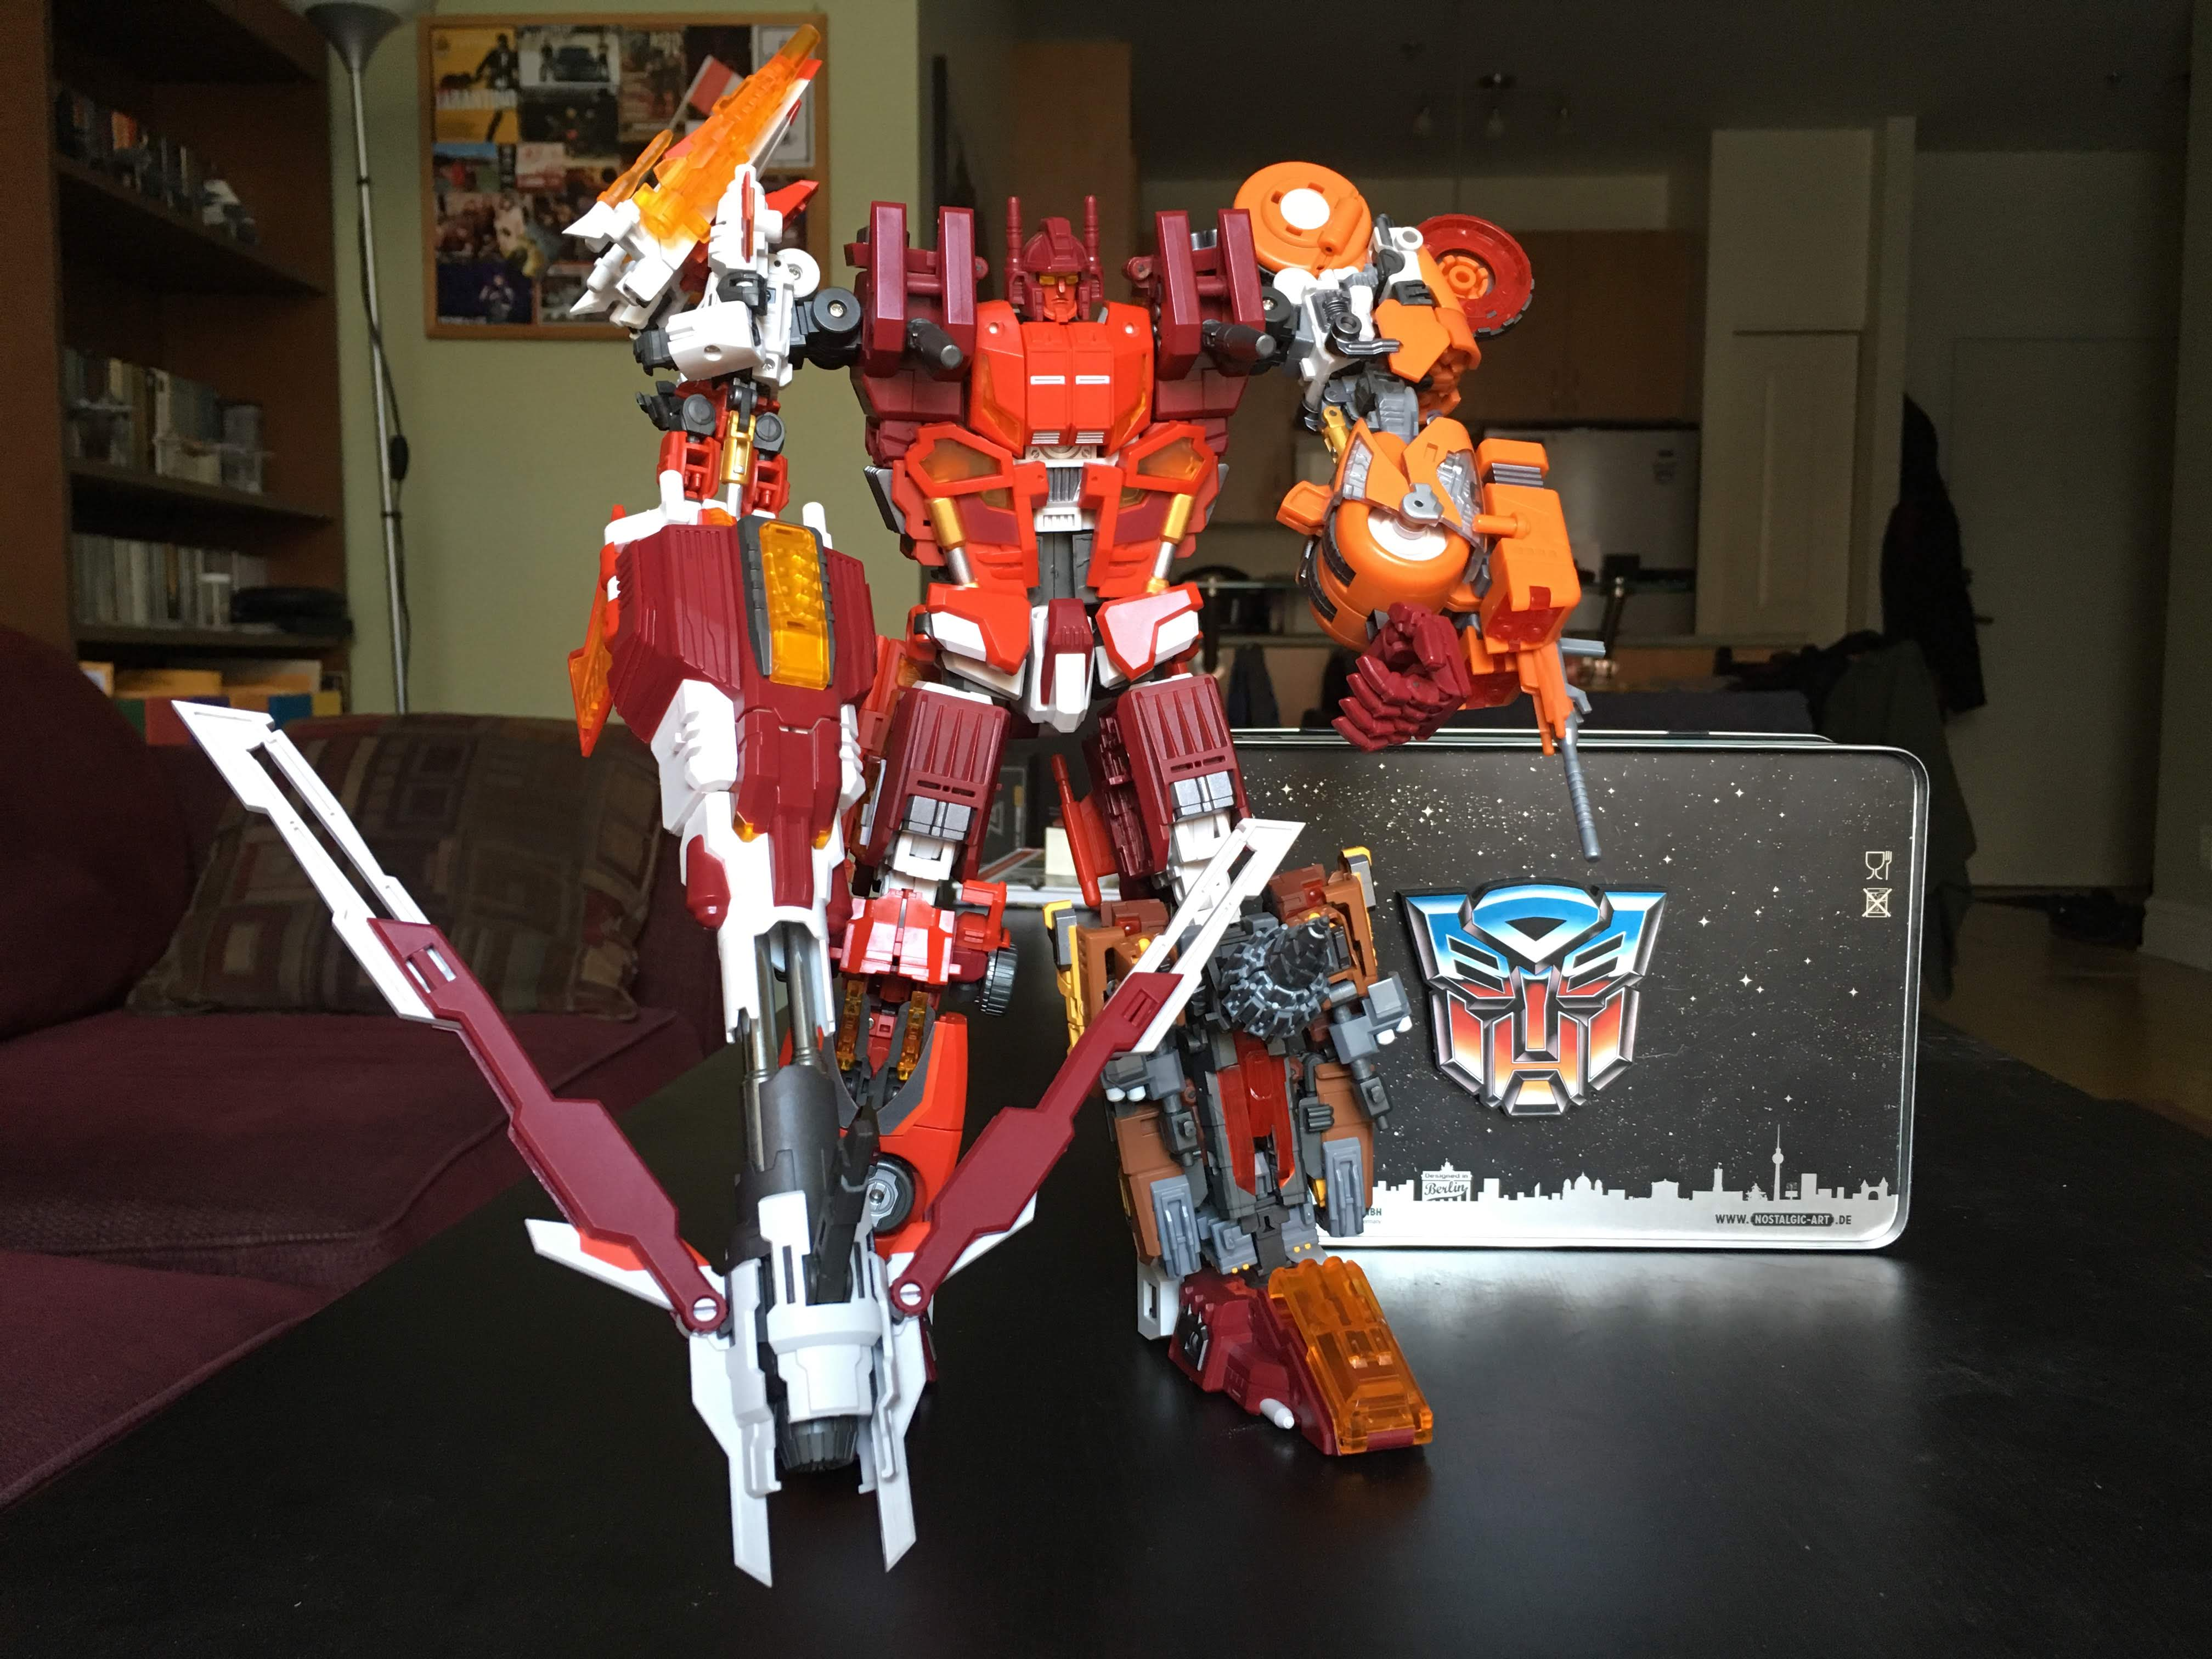 Transformers Combiner Technobots Scattershot Shoulder Gun Weapon Part Piece